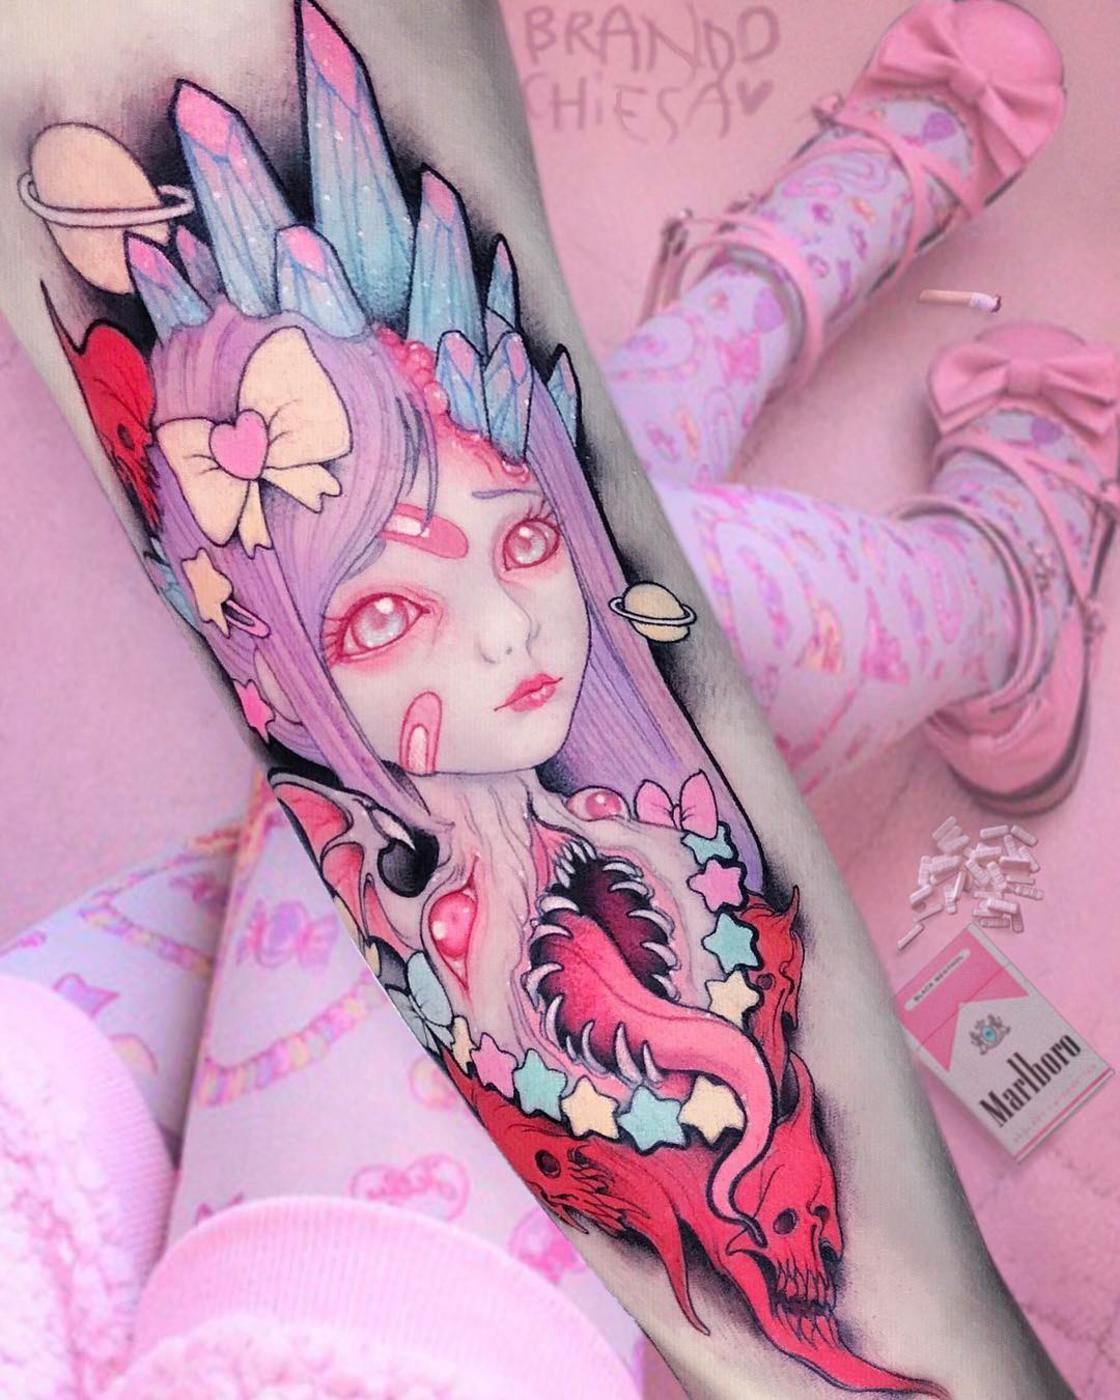 pink-gore-tattoos-brando-chiesa-3.jpg